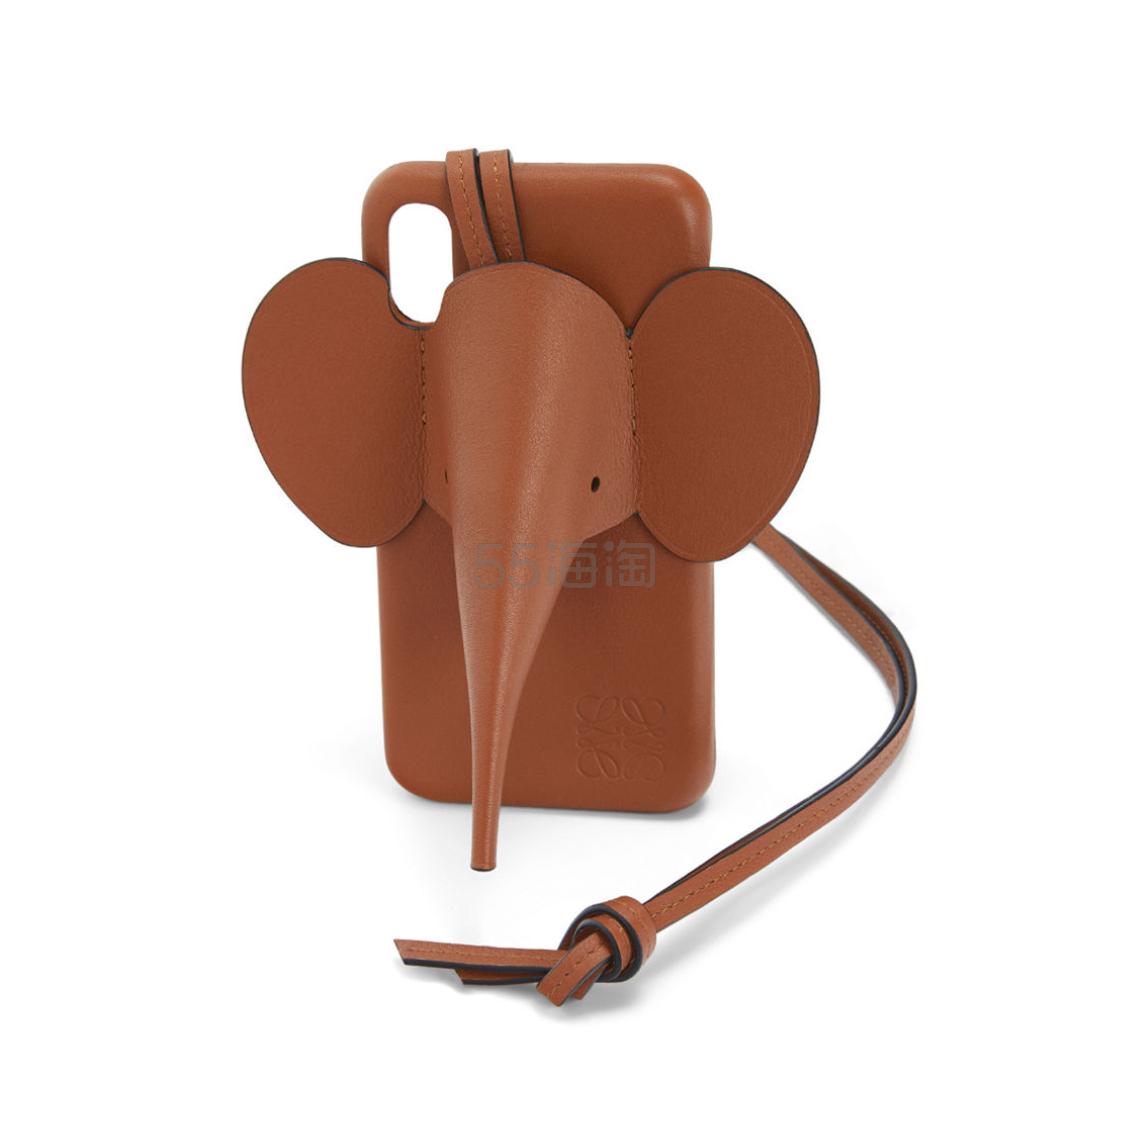 【满0返礼品卡】Loewe Elephant Phone Cover 大象手机壳